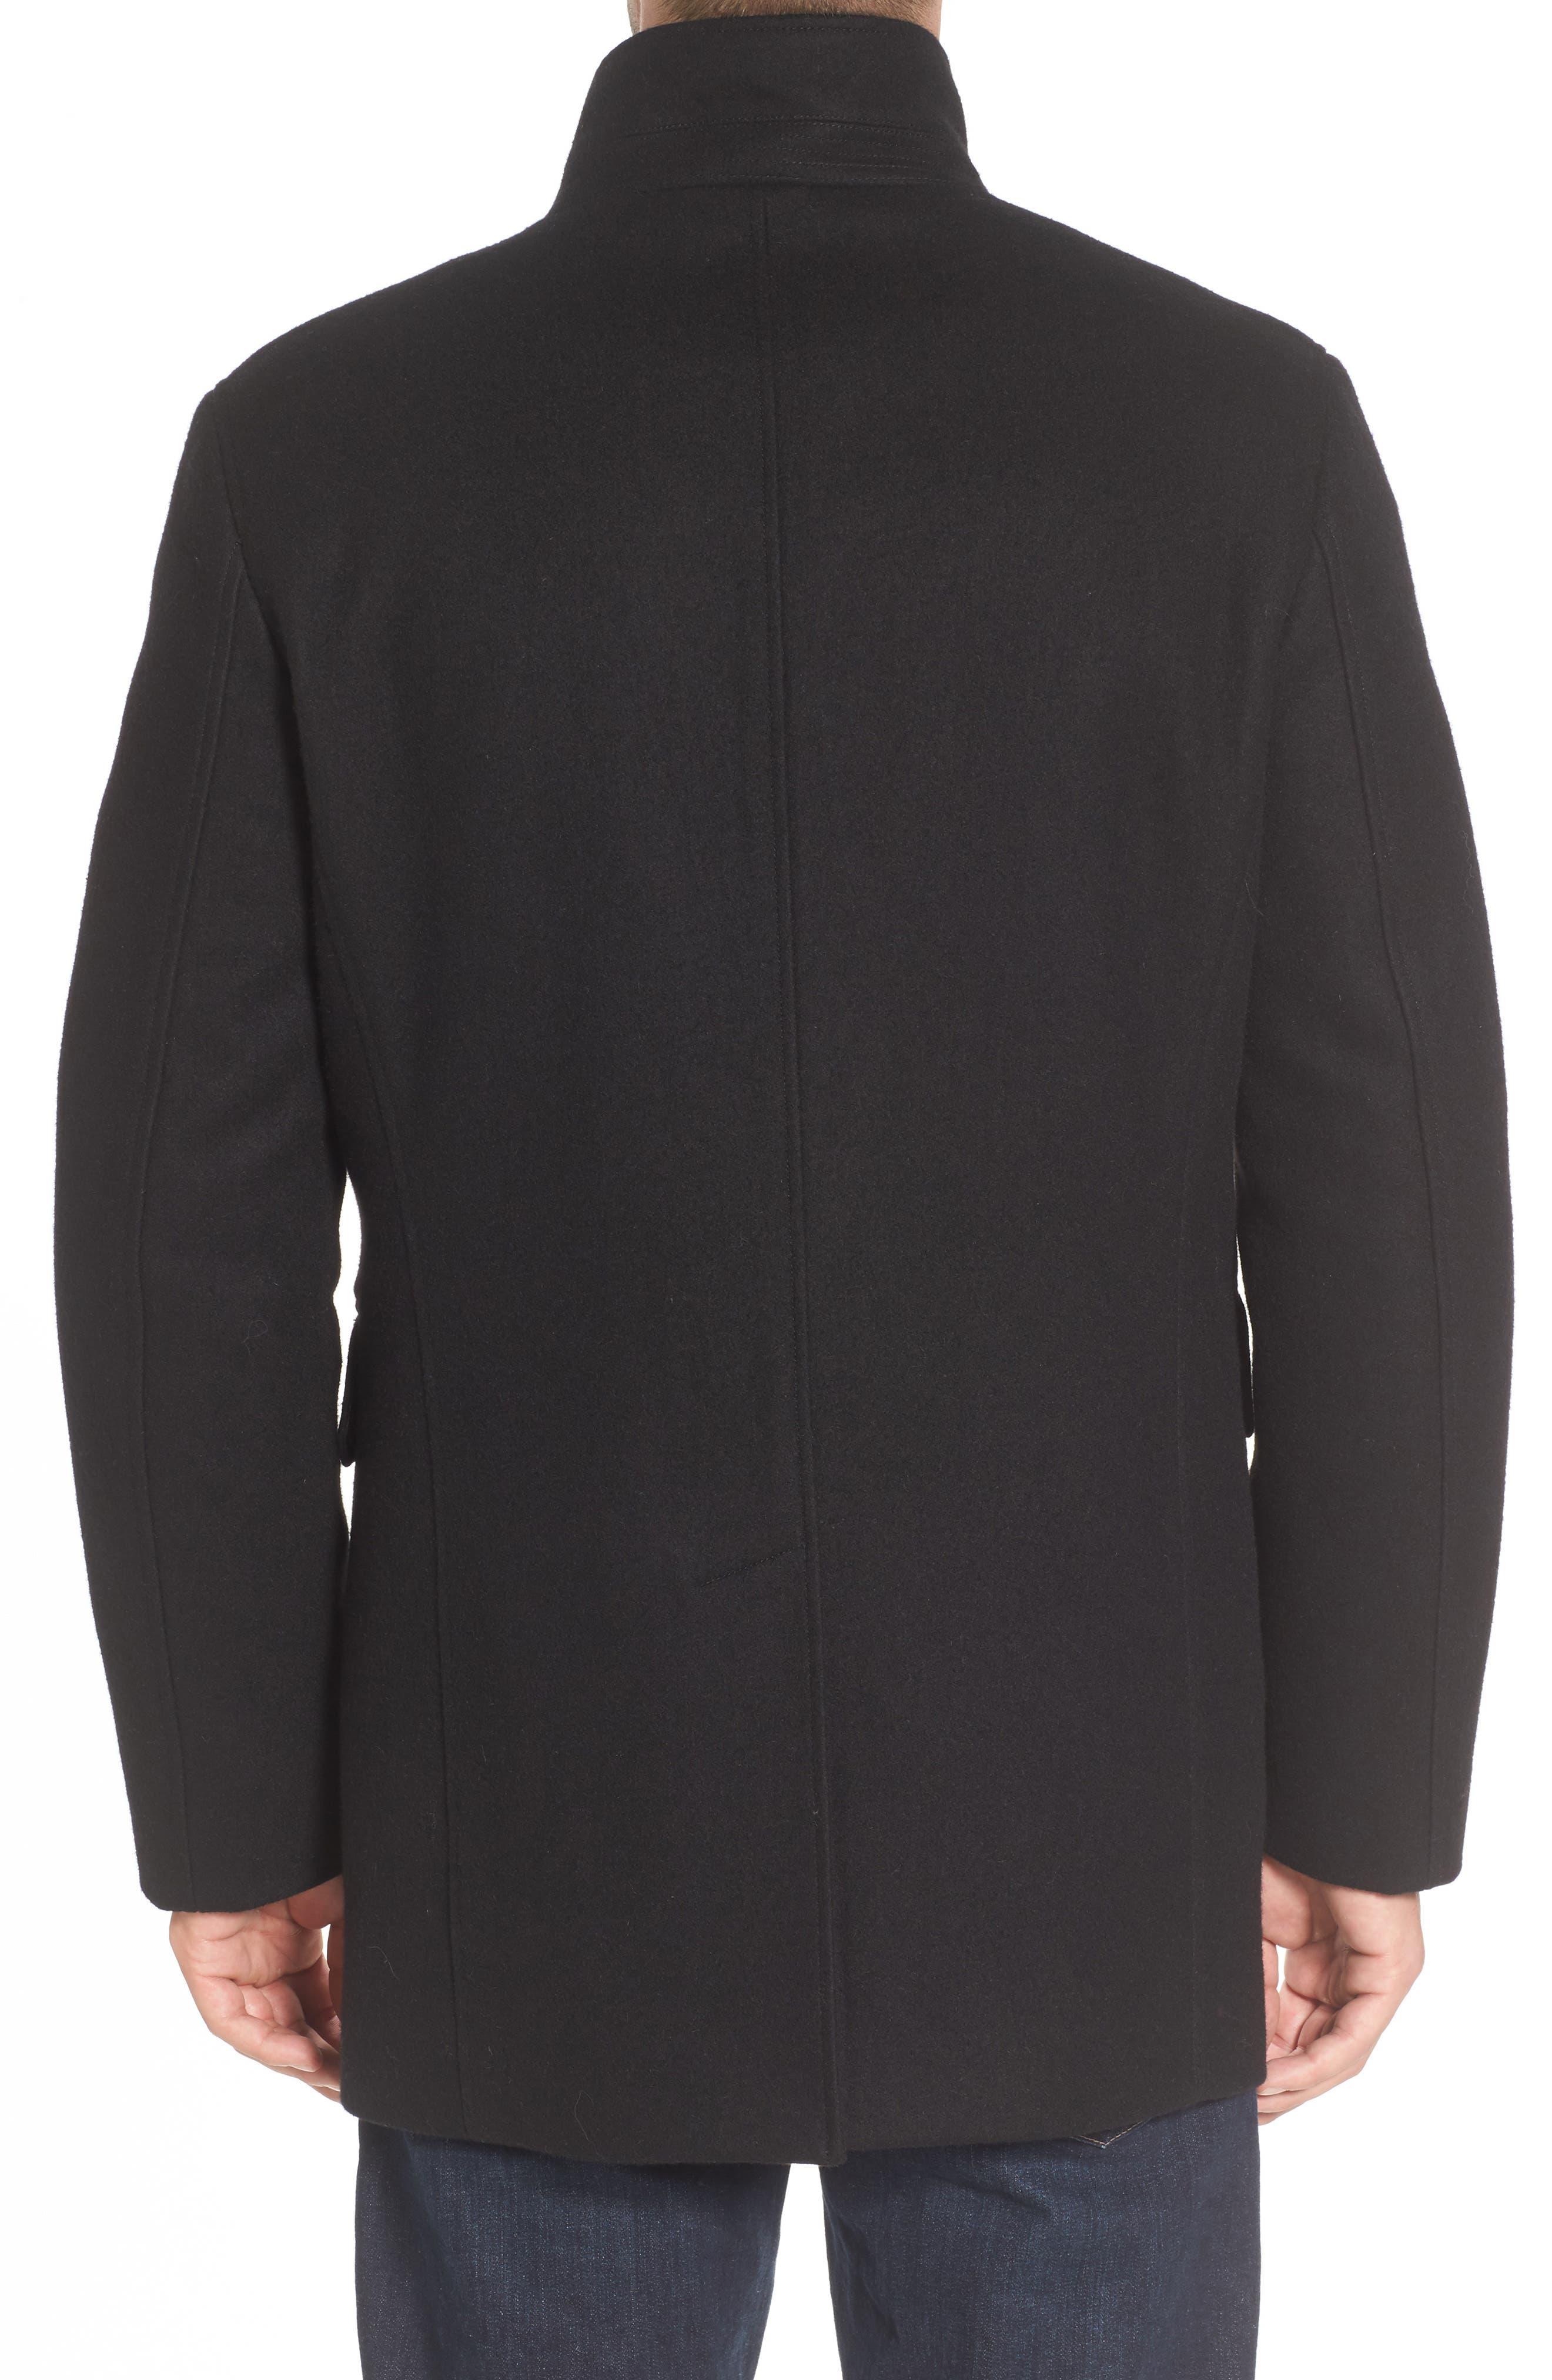 Wool Blend 3-in-1 Topcoat,                             Alternate thumbnail 2, color,                             001